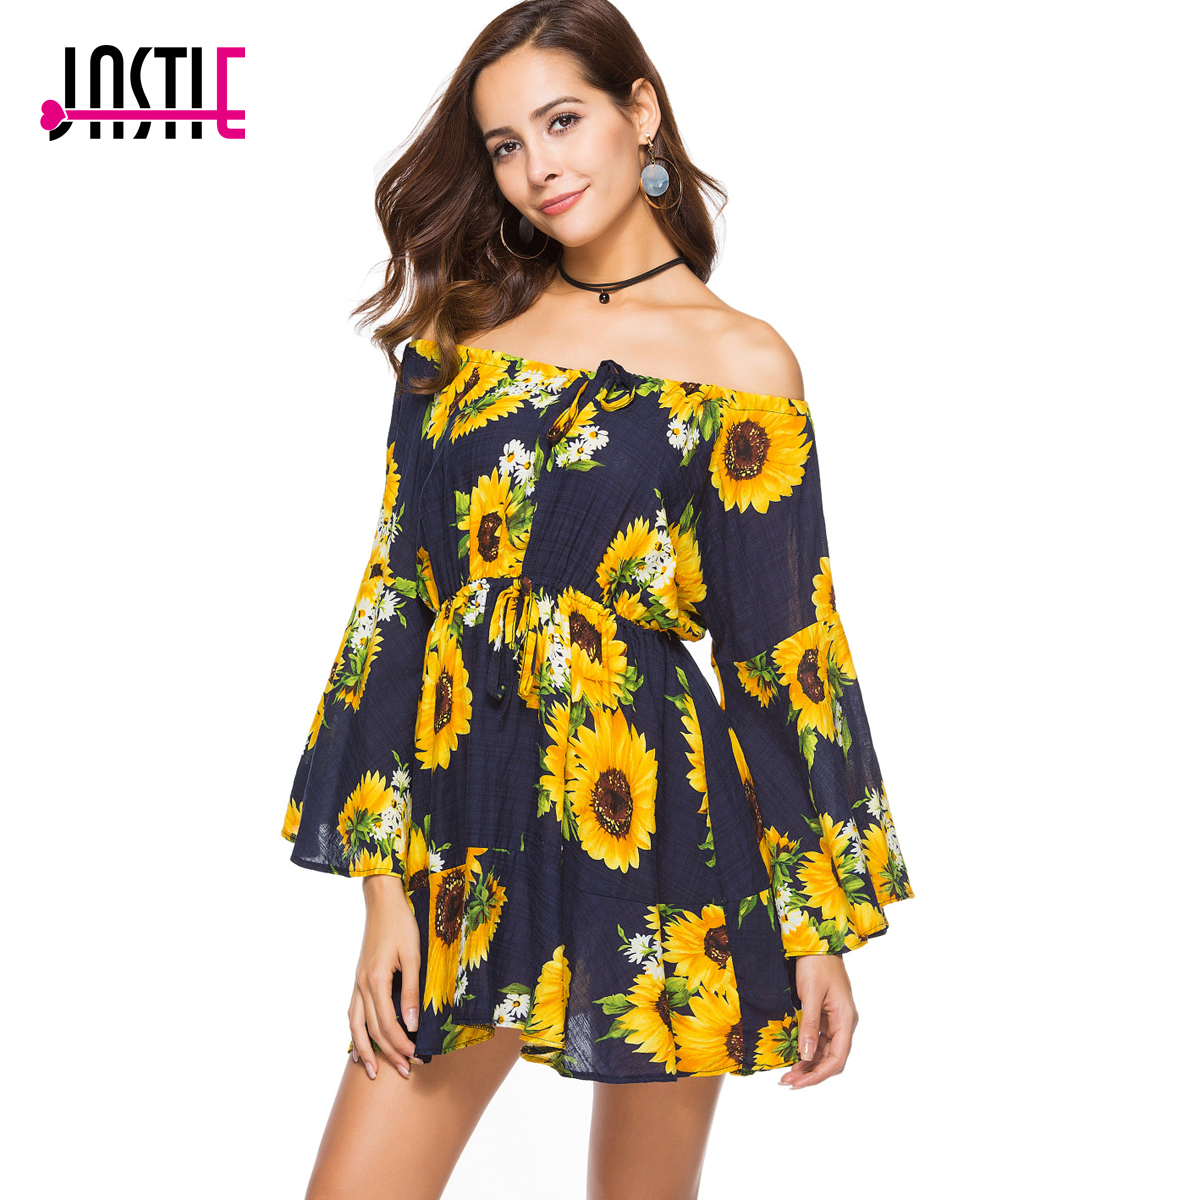 8e7fc52dbaac Aliexpress.com : Buy Jastie Slash Neck with Tie Sexy Mini Dress Sunflower  Print Summer Dress Bohemia People Hippie Beach Dresses 2018 Women Vestidos  from ...